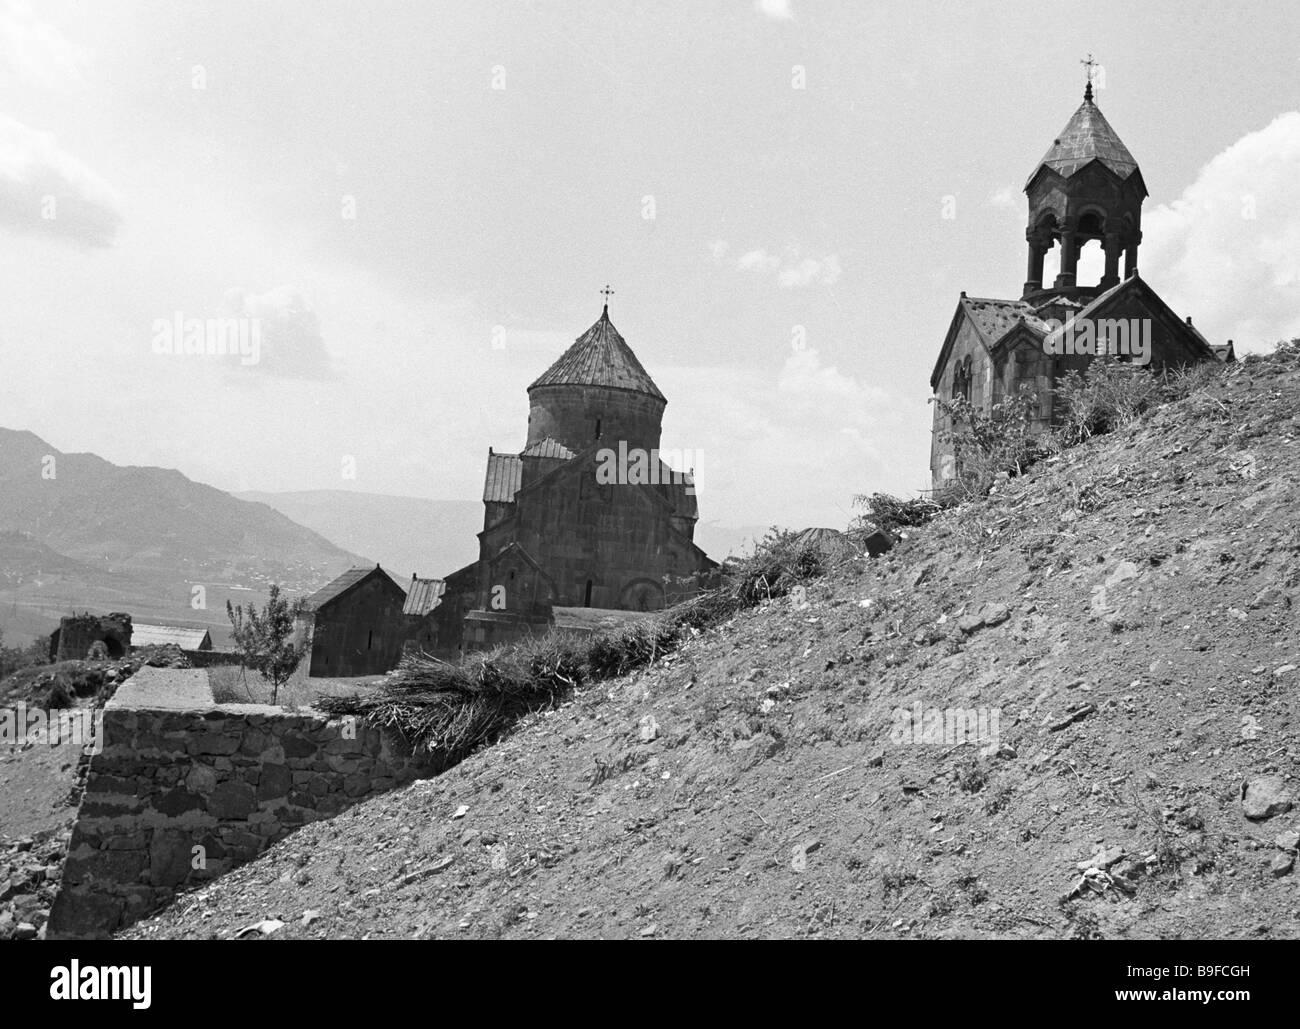 The Akhpat Monastery 10th 13th century - Stock Image